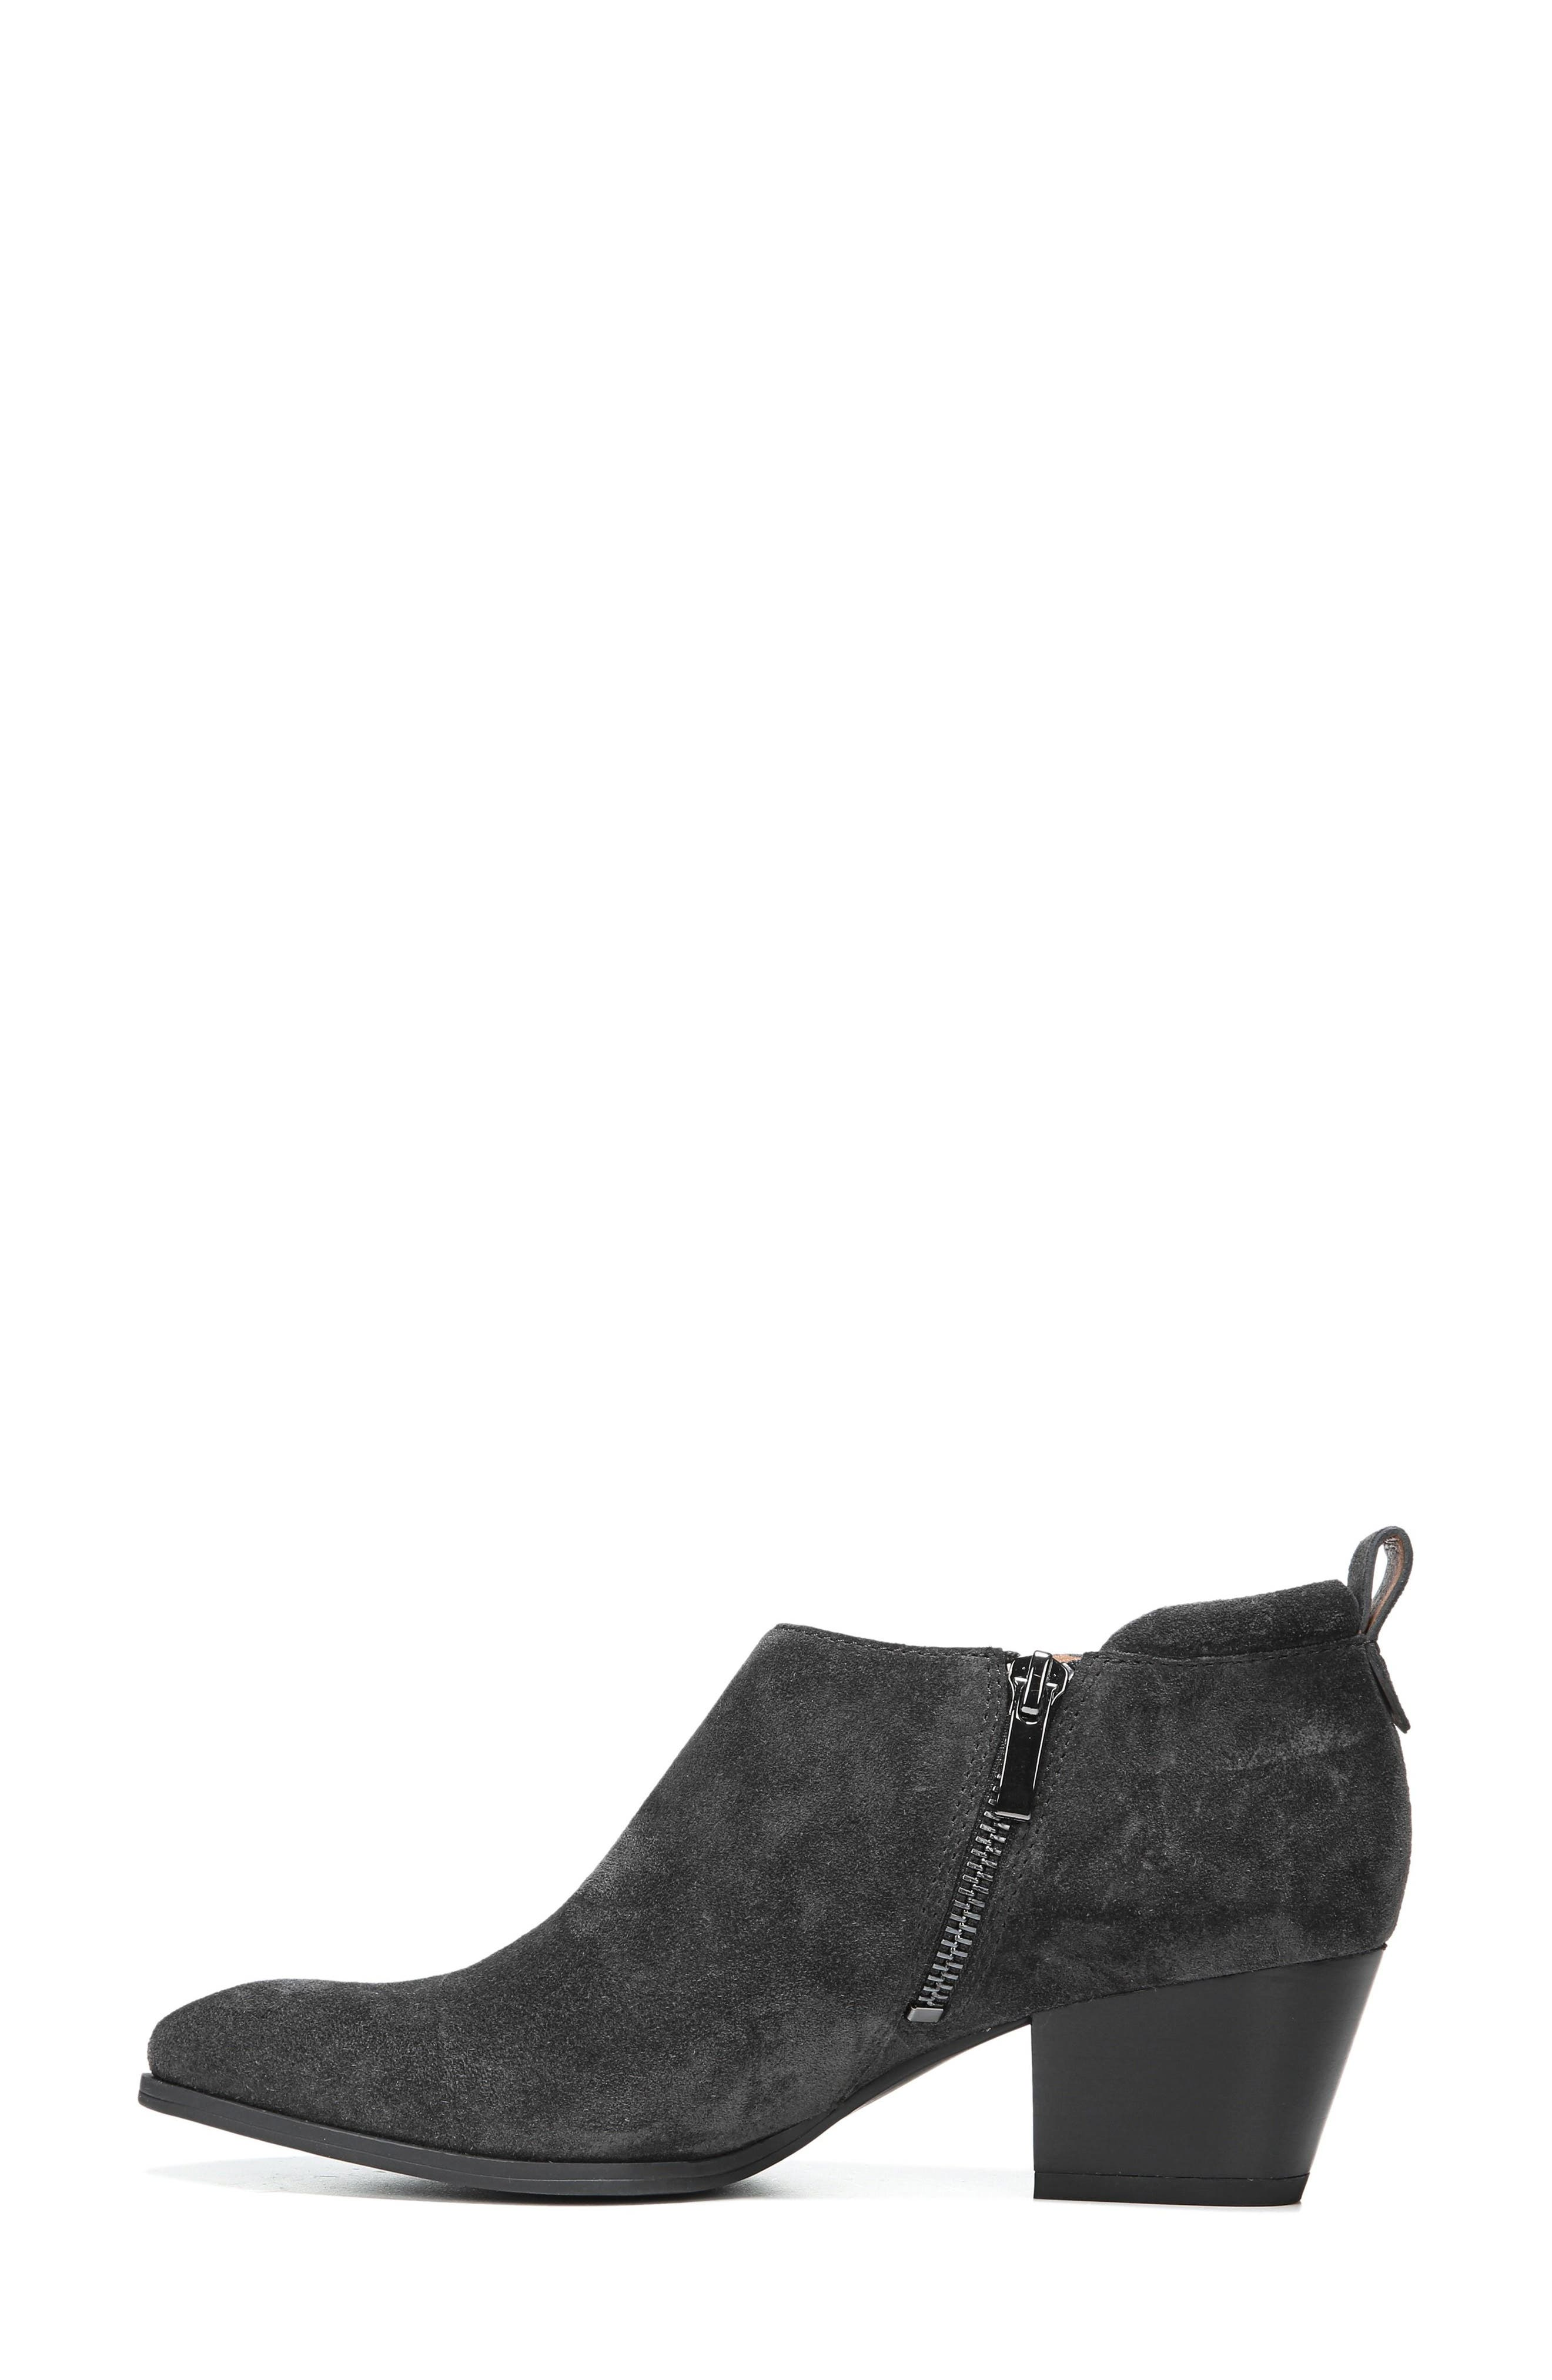 'Granite' Block Heel Bootie,                             Alternate thumbnail 13, color,